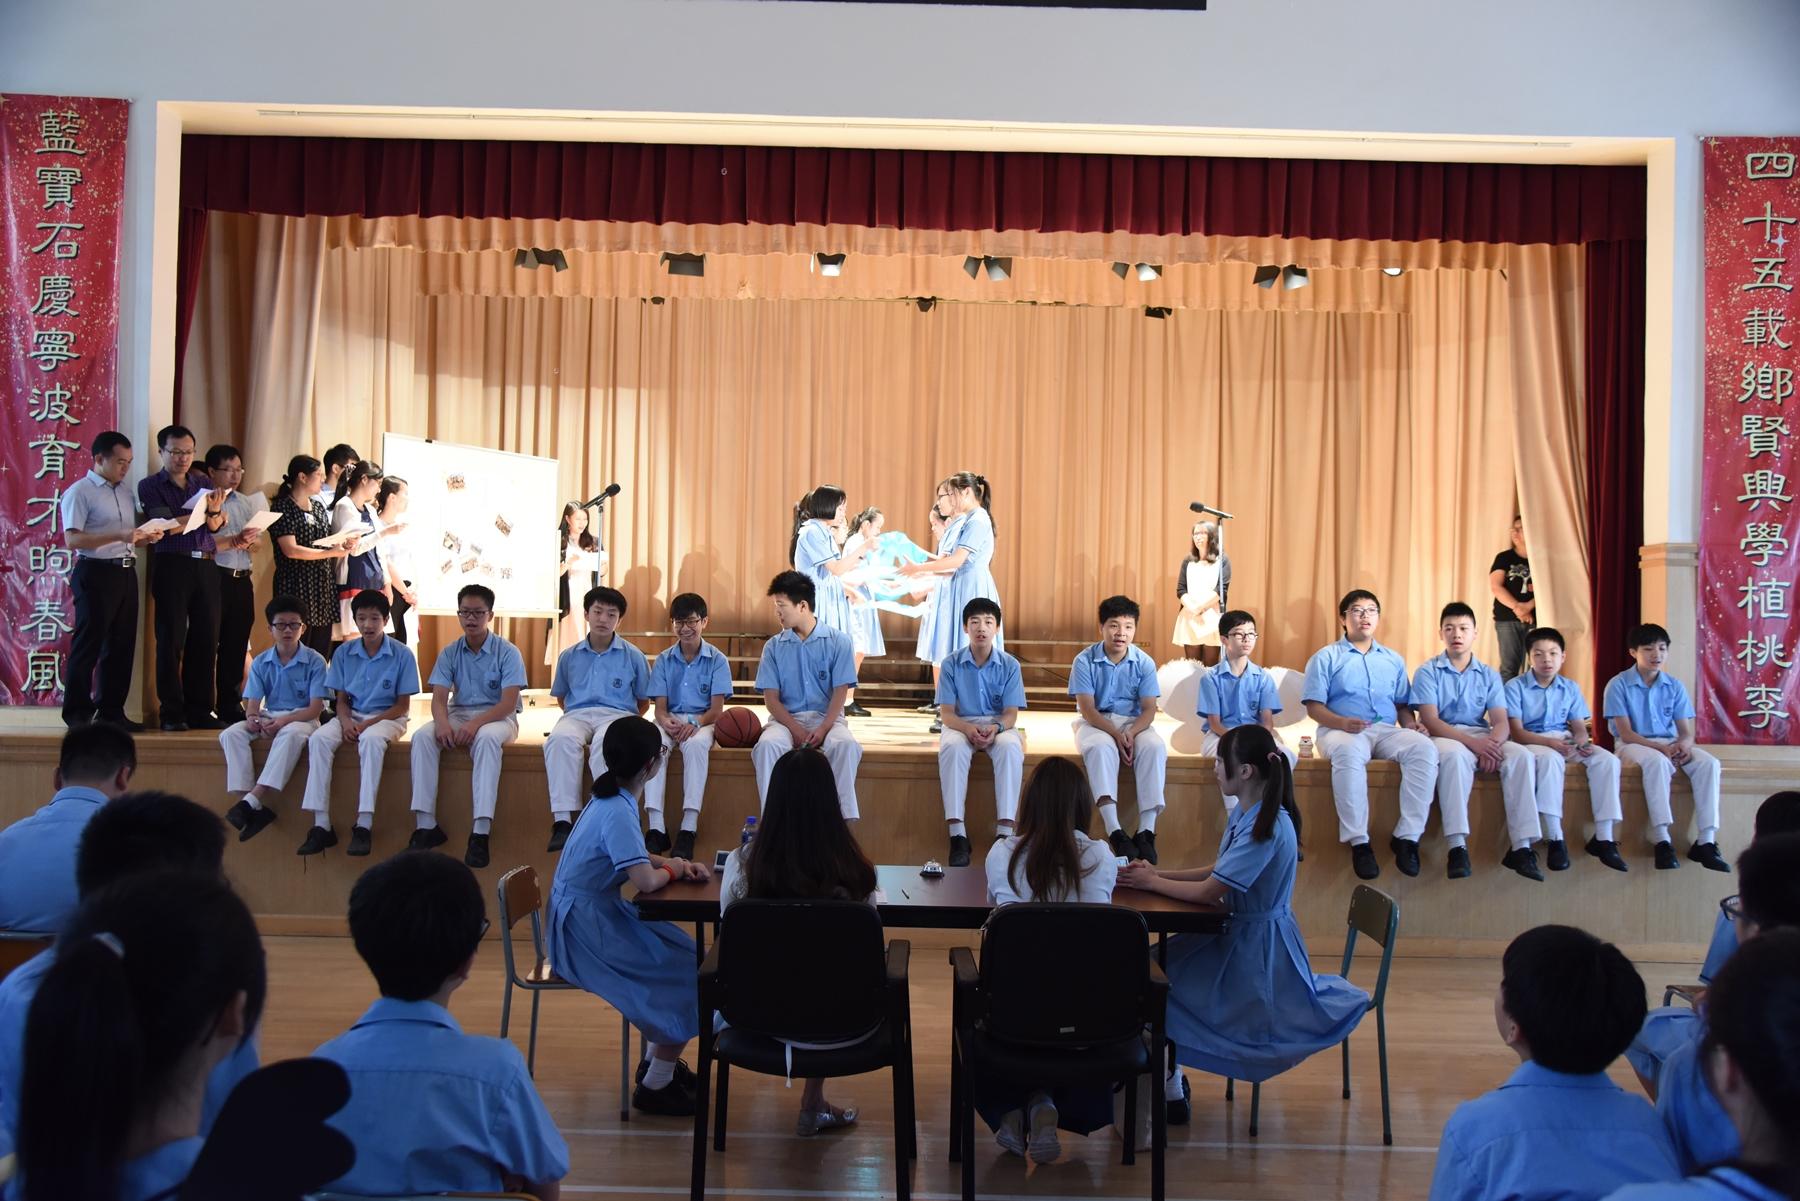 http://npc.edu.hk/sites/default/files/dsc_3104.jpg